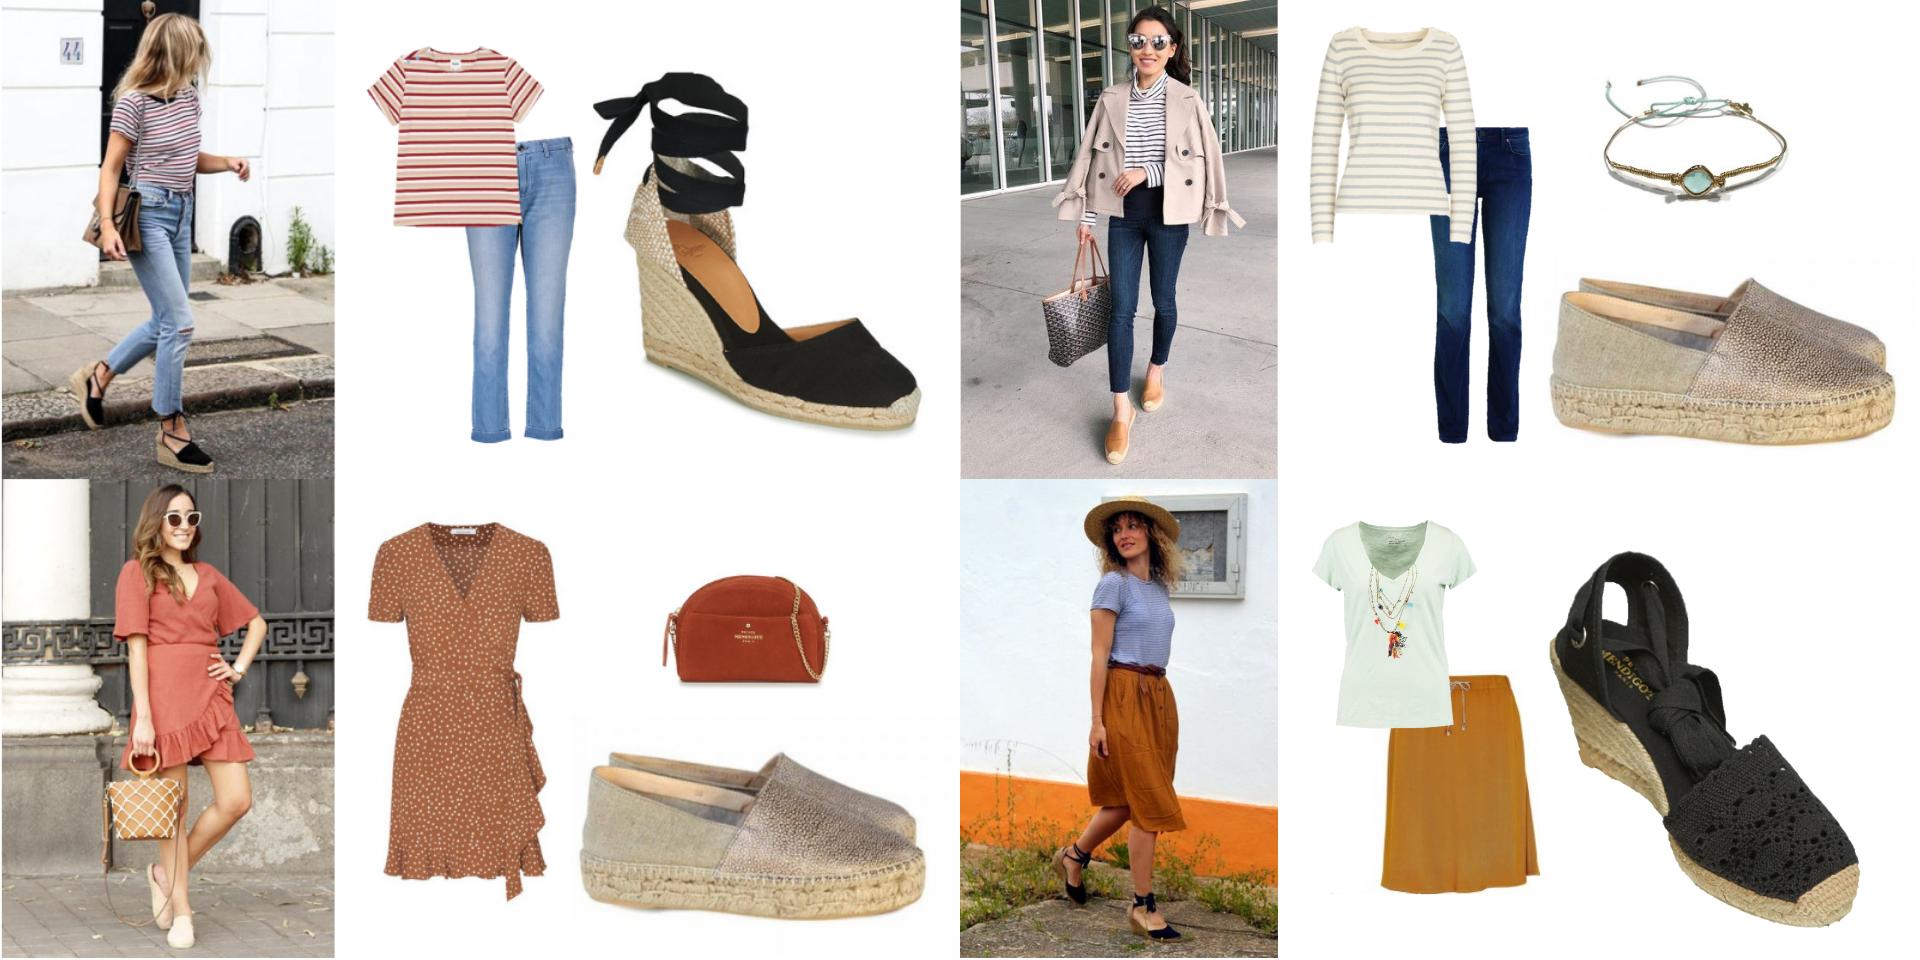 tendance, shopping, espadrilles, essayage, box, malle, conseils, styliste, printemps, chaussures